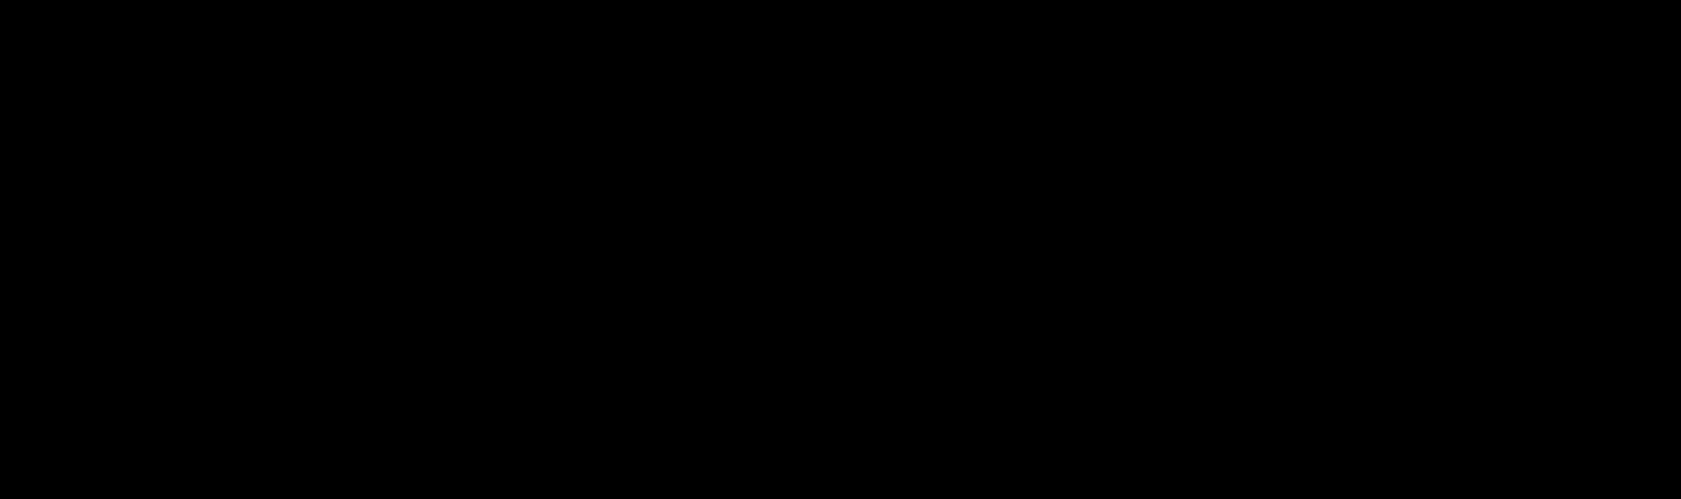 ACMG 2021 logo image